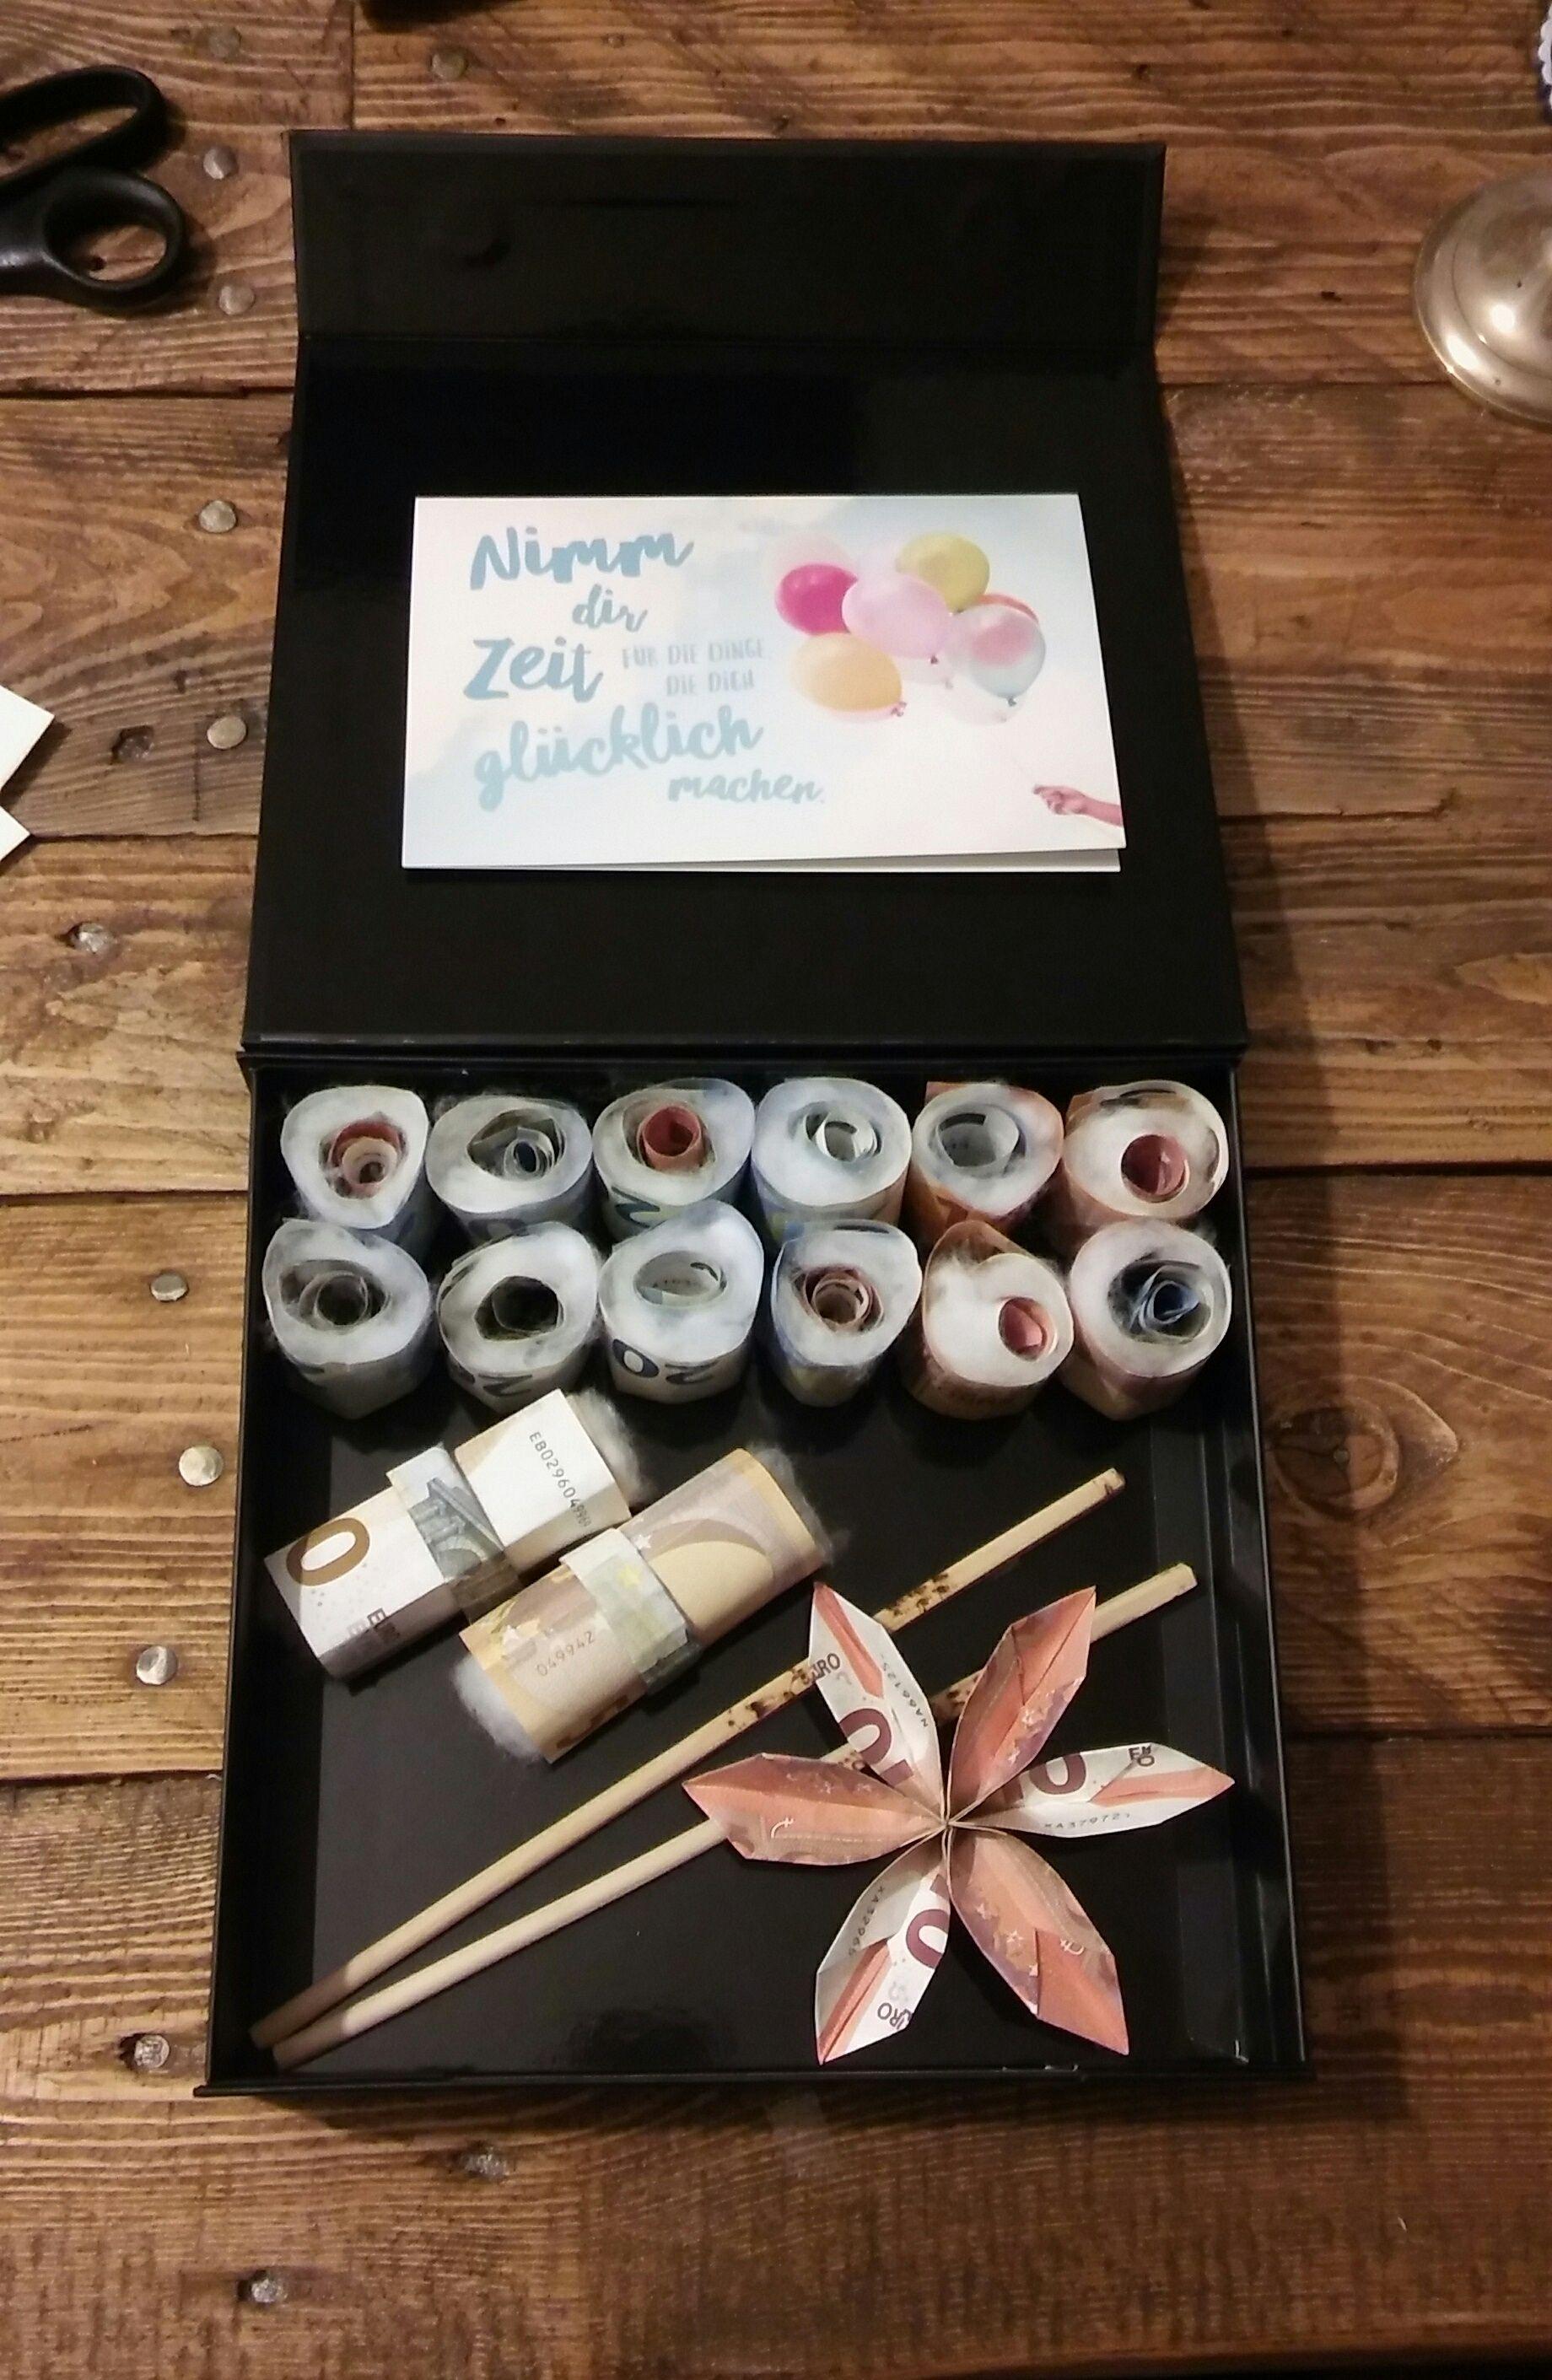 diy sushi in a box sushi in der schachtel sushi geldgeschenk sushi gratuity selfmade. Black Bedroom Furniture Sets. Home Design Ideas